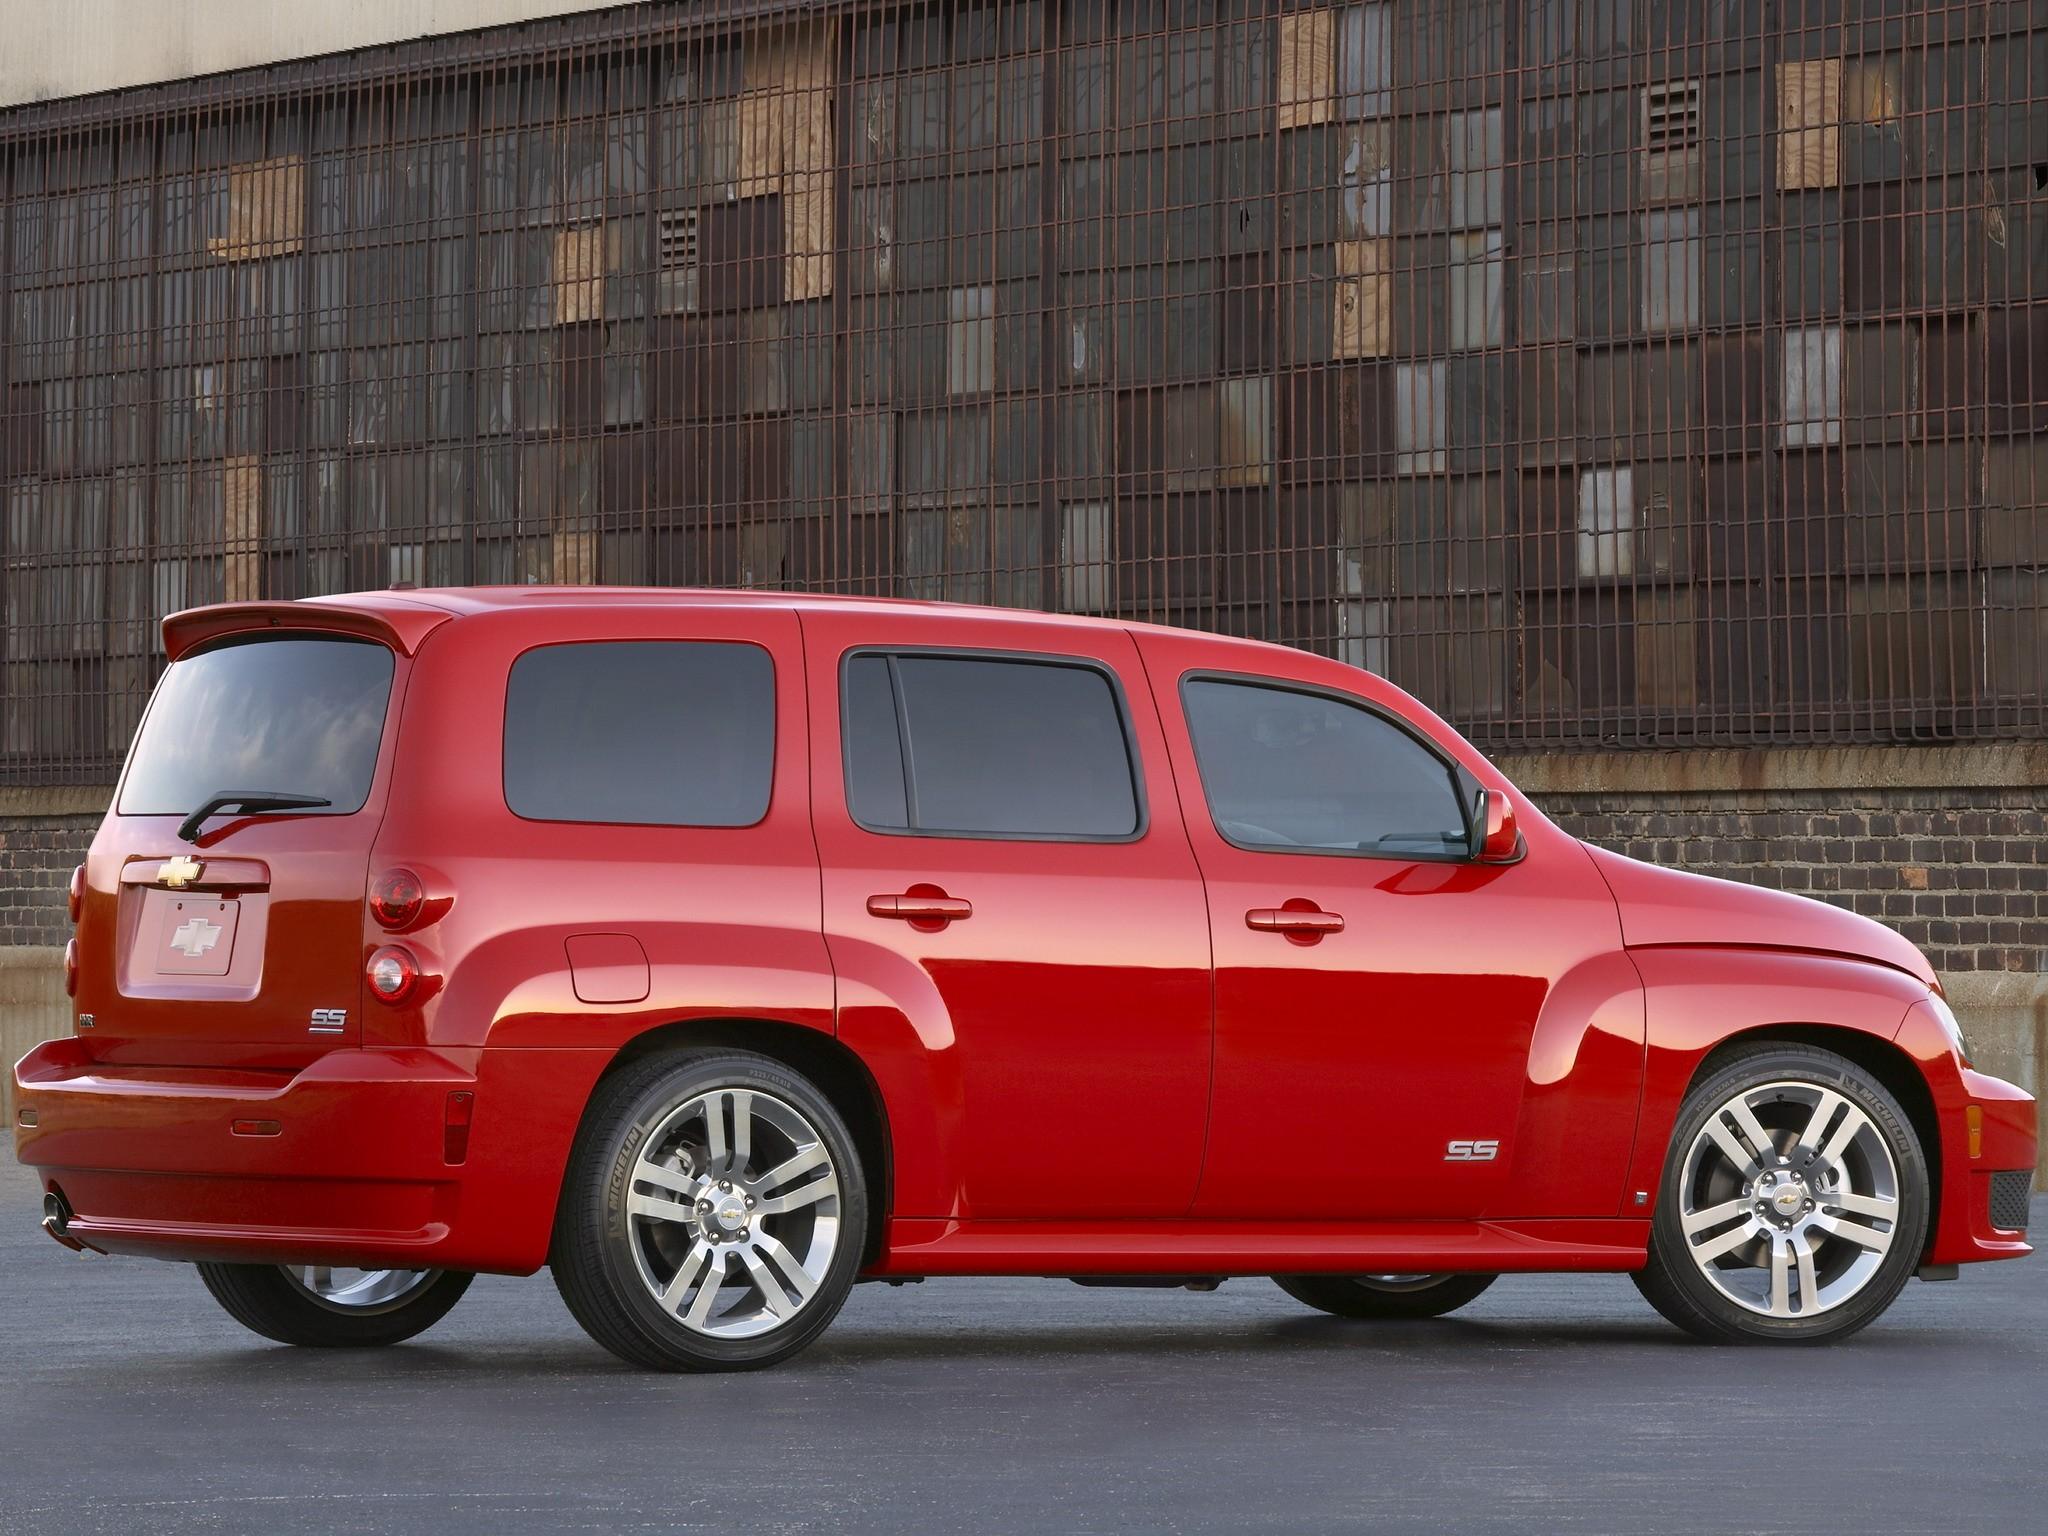 Chevrolet Hhr Ss Specs Photos 2007 2008 2009 2010 2011